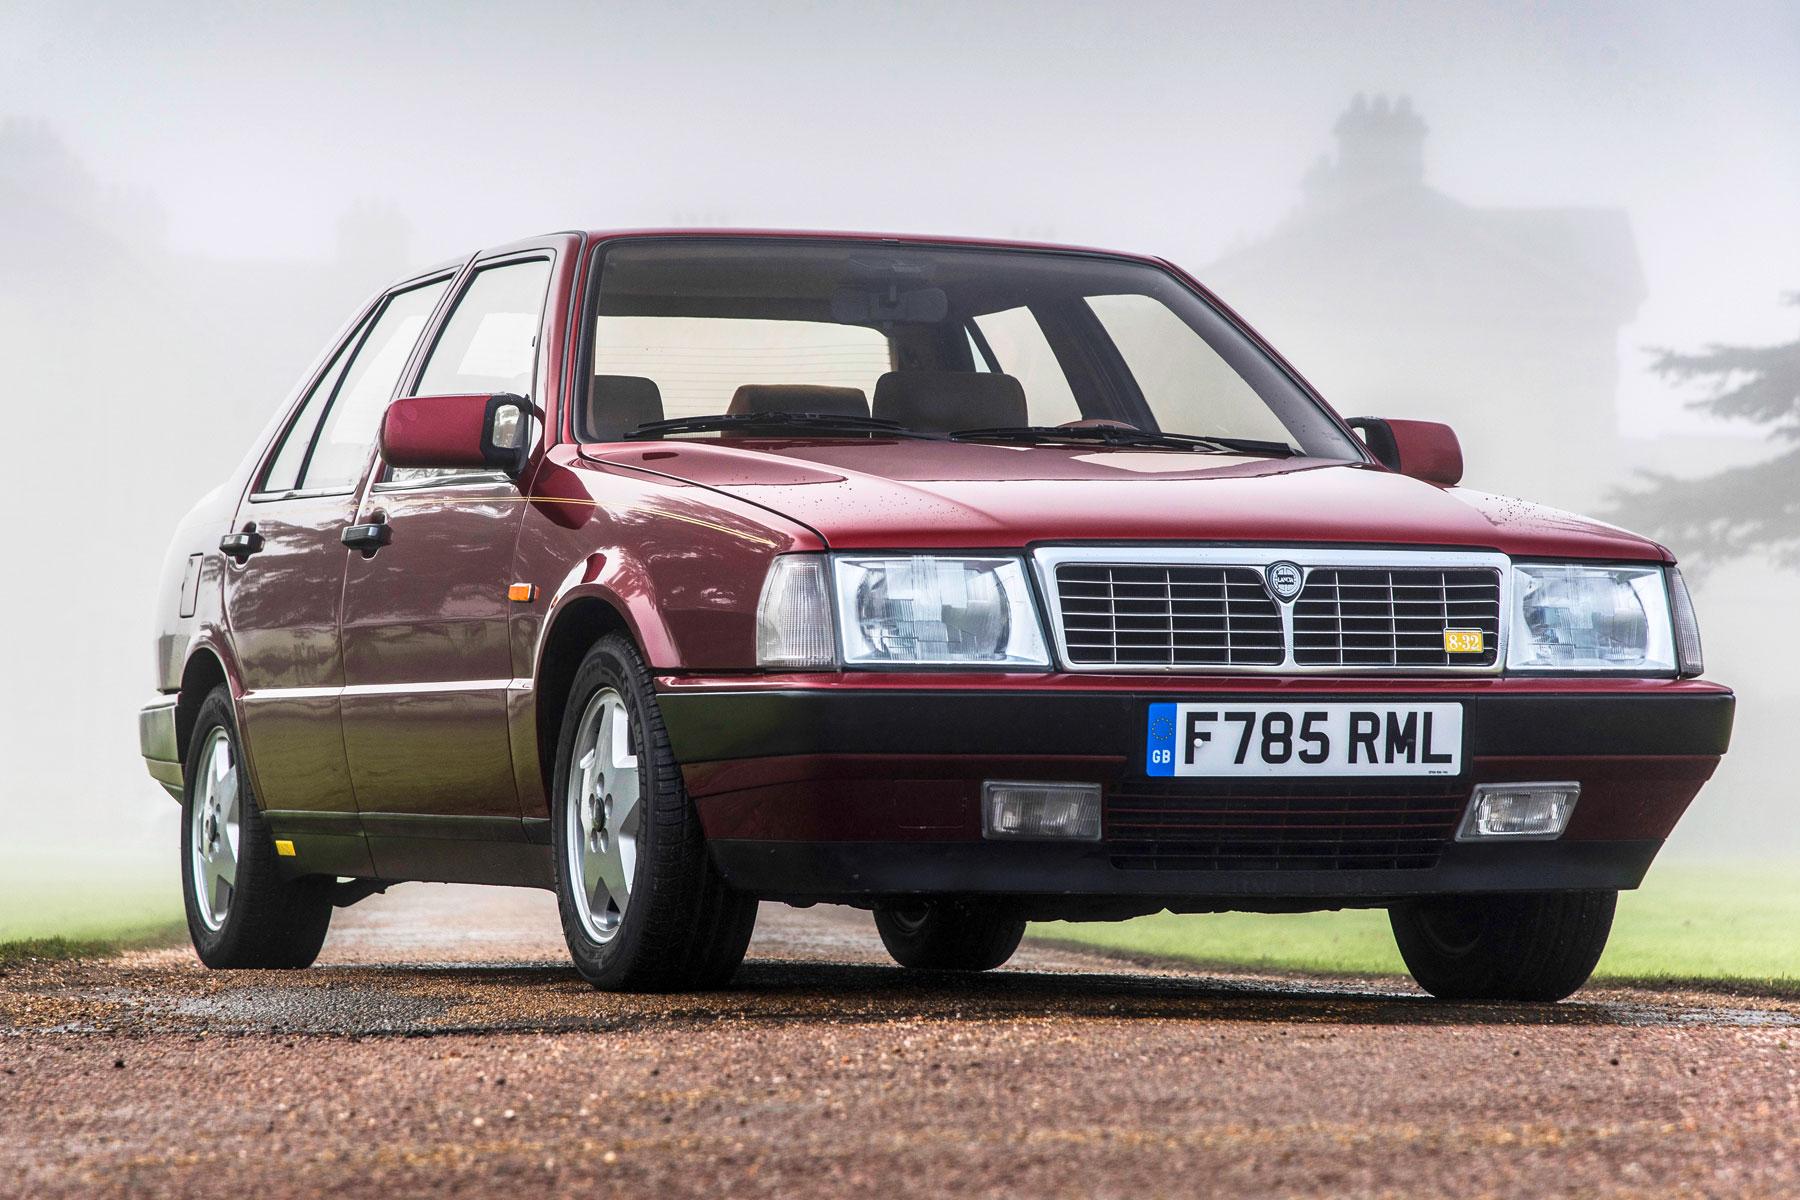 https://www.motoringresearch.com/wp-content/uploads/2018/01/Lancia-Thema-8.32-owned-by-Rowan-Atkinson.jpg